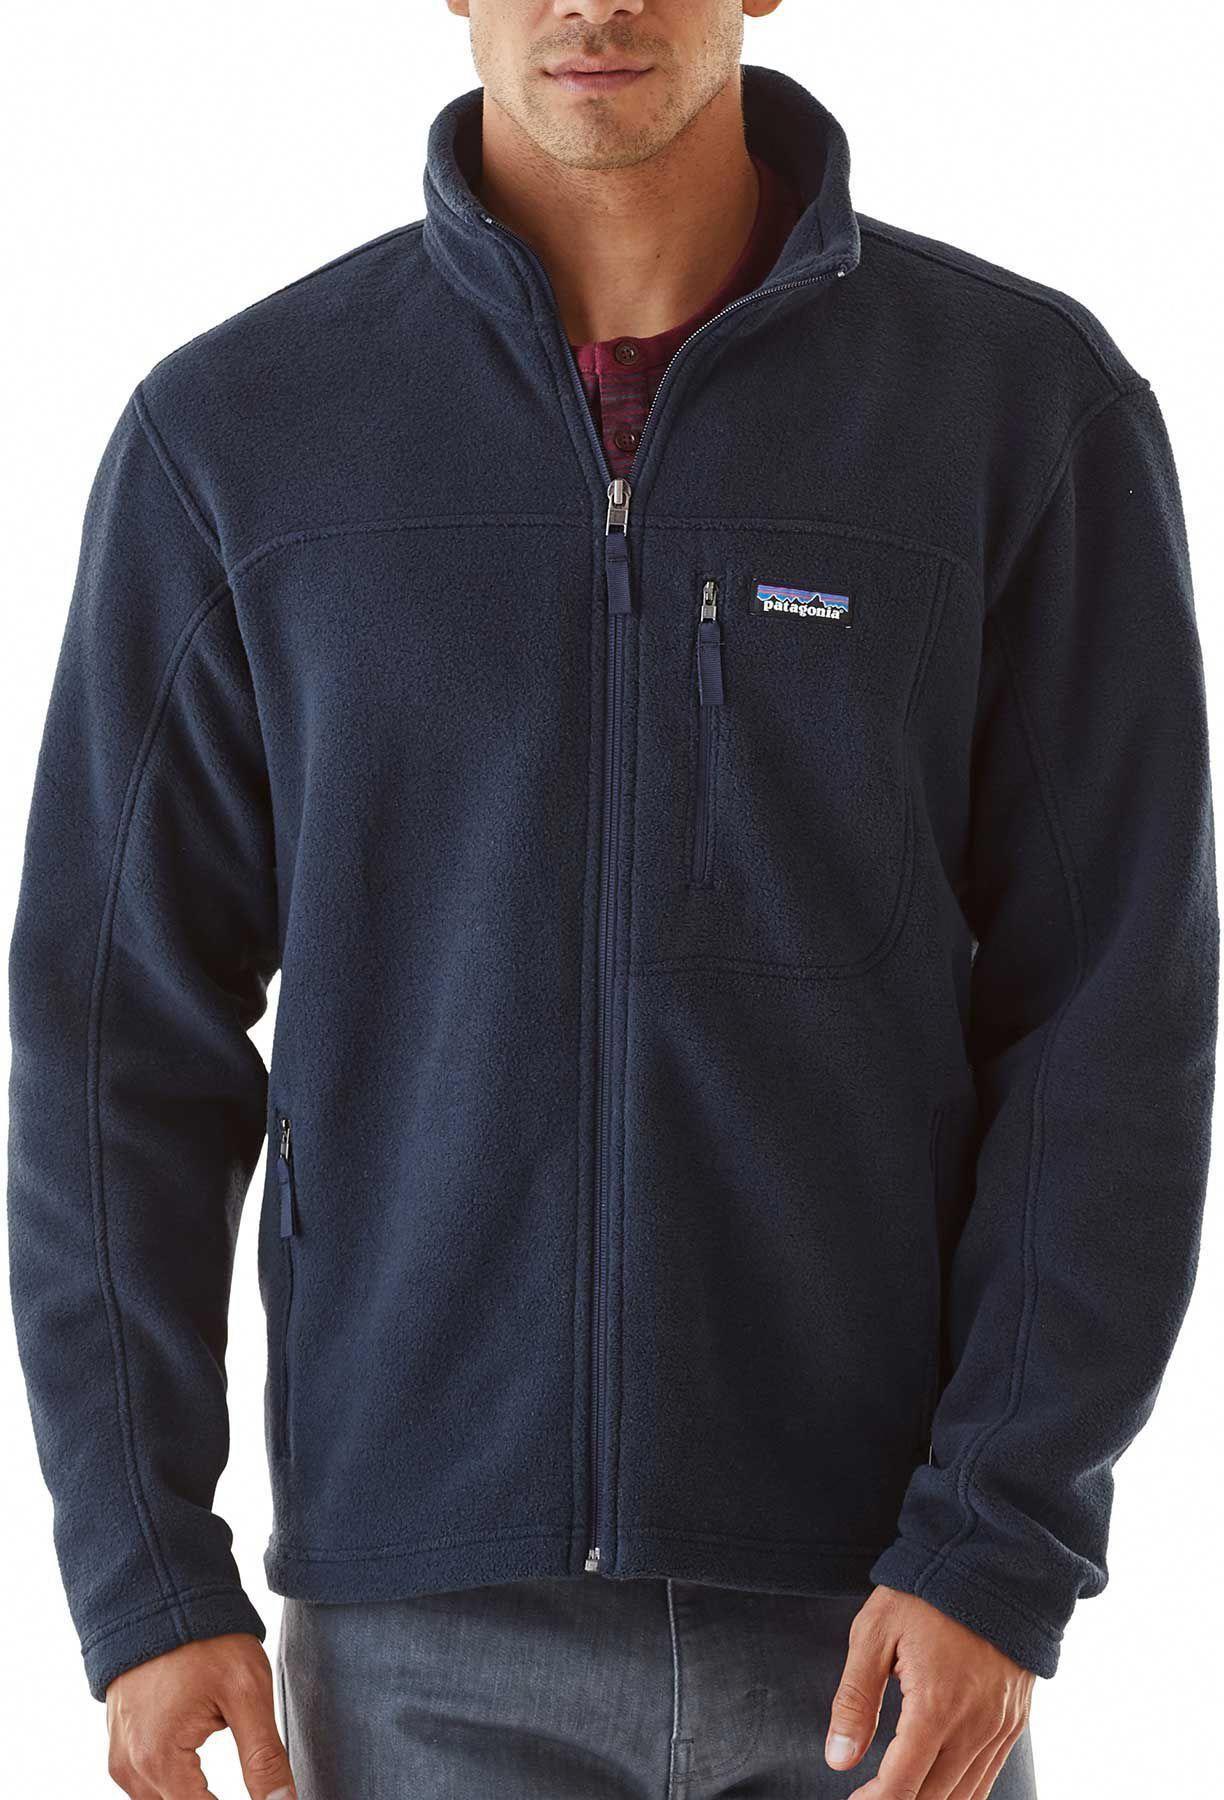 Guys Fashion Trends Classymensfashion Mens Fashion Sweaters Mens Fashion Casual Mens Outfits [ 1800 x 1224 Pixel ]